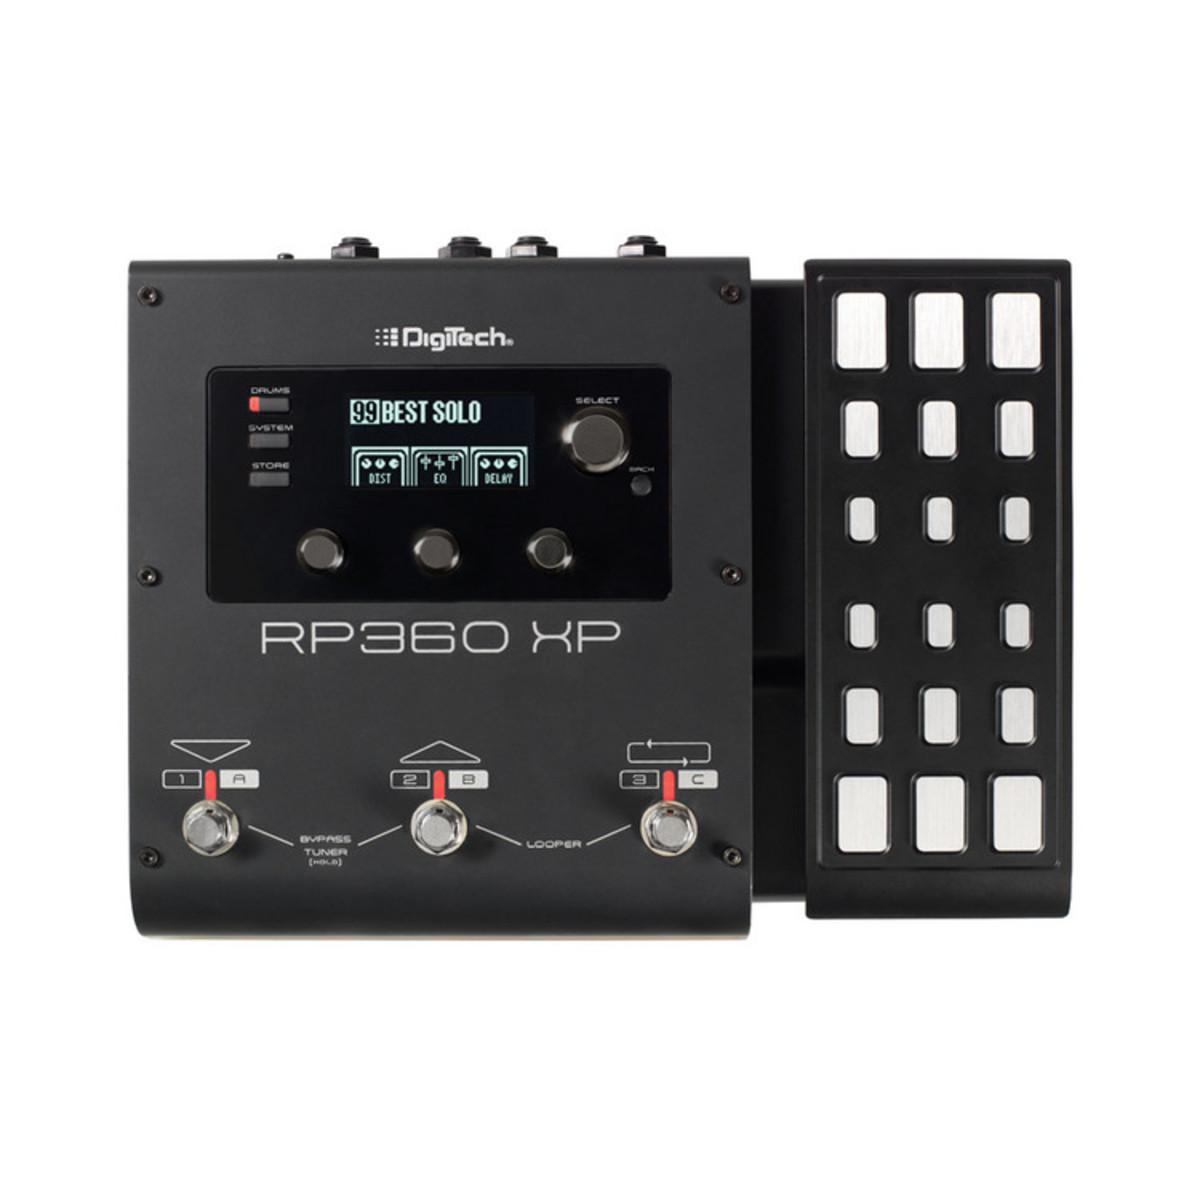 RP360XP